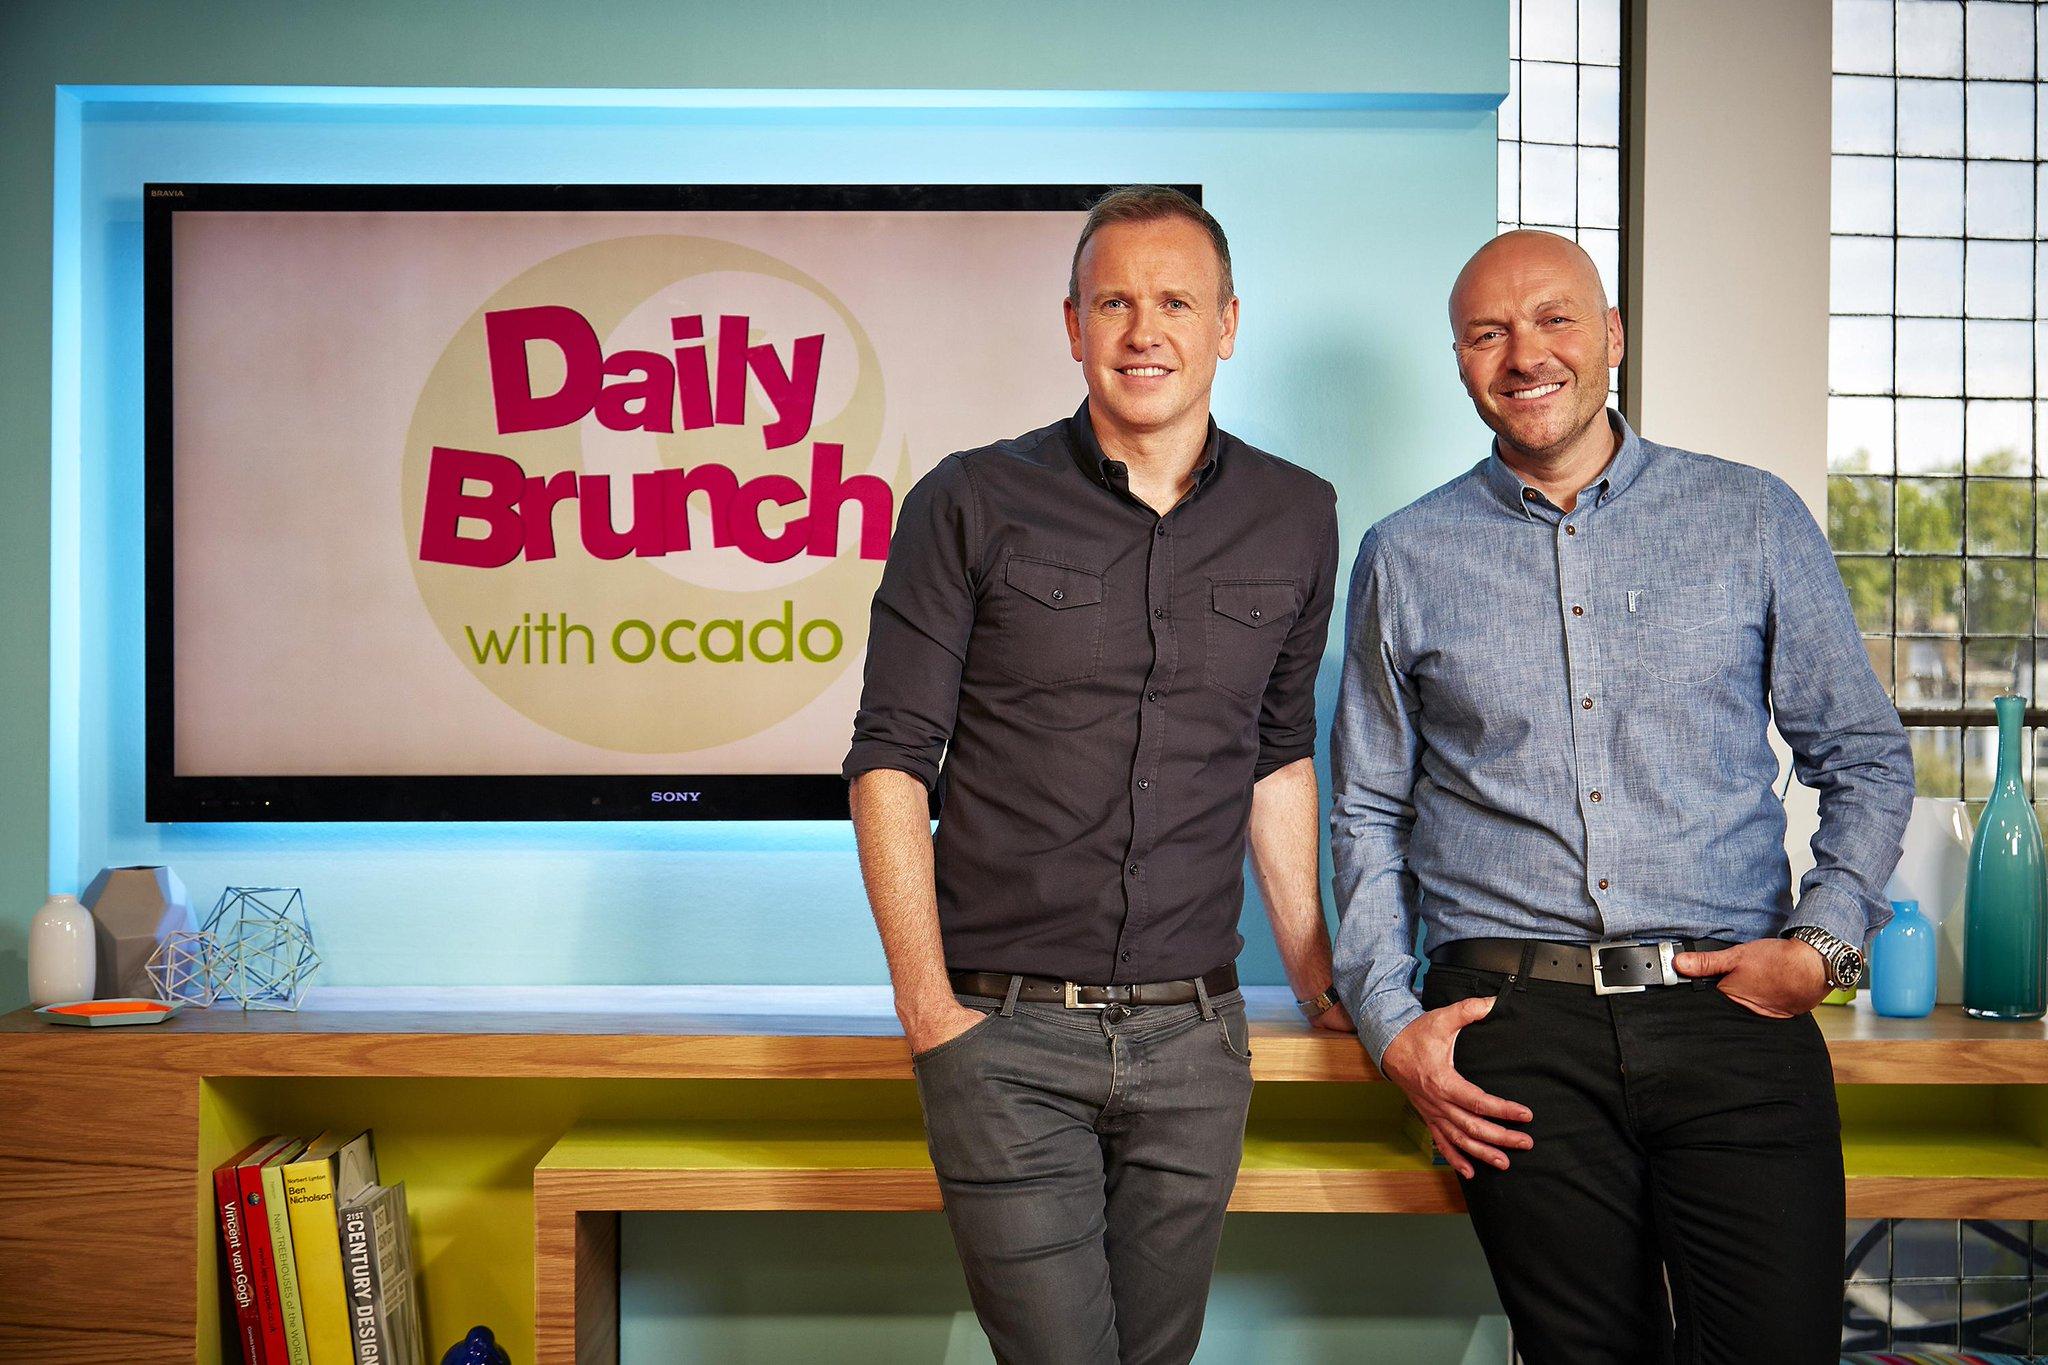 RT @surreysmashers: Catch @gabbywhite011 @ChrisAdcock1 on the sofa with @timlovejoy @simonrim on Friday's @DailyBrunchC4, 10am, Channel 4 h…